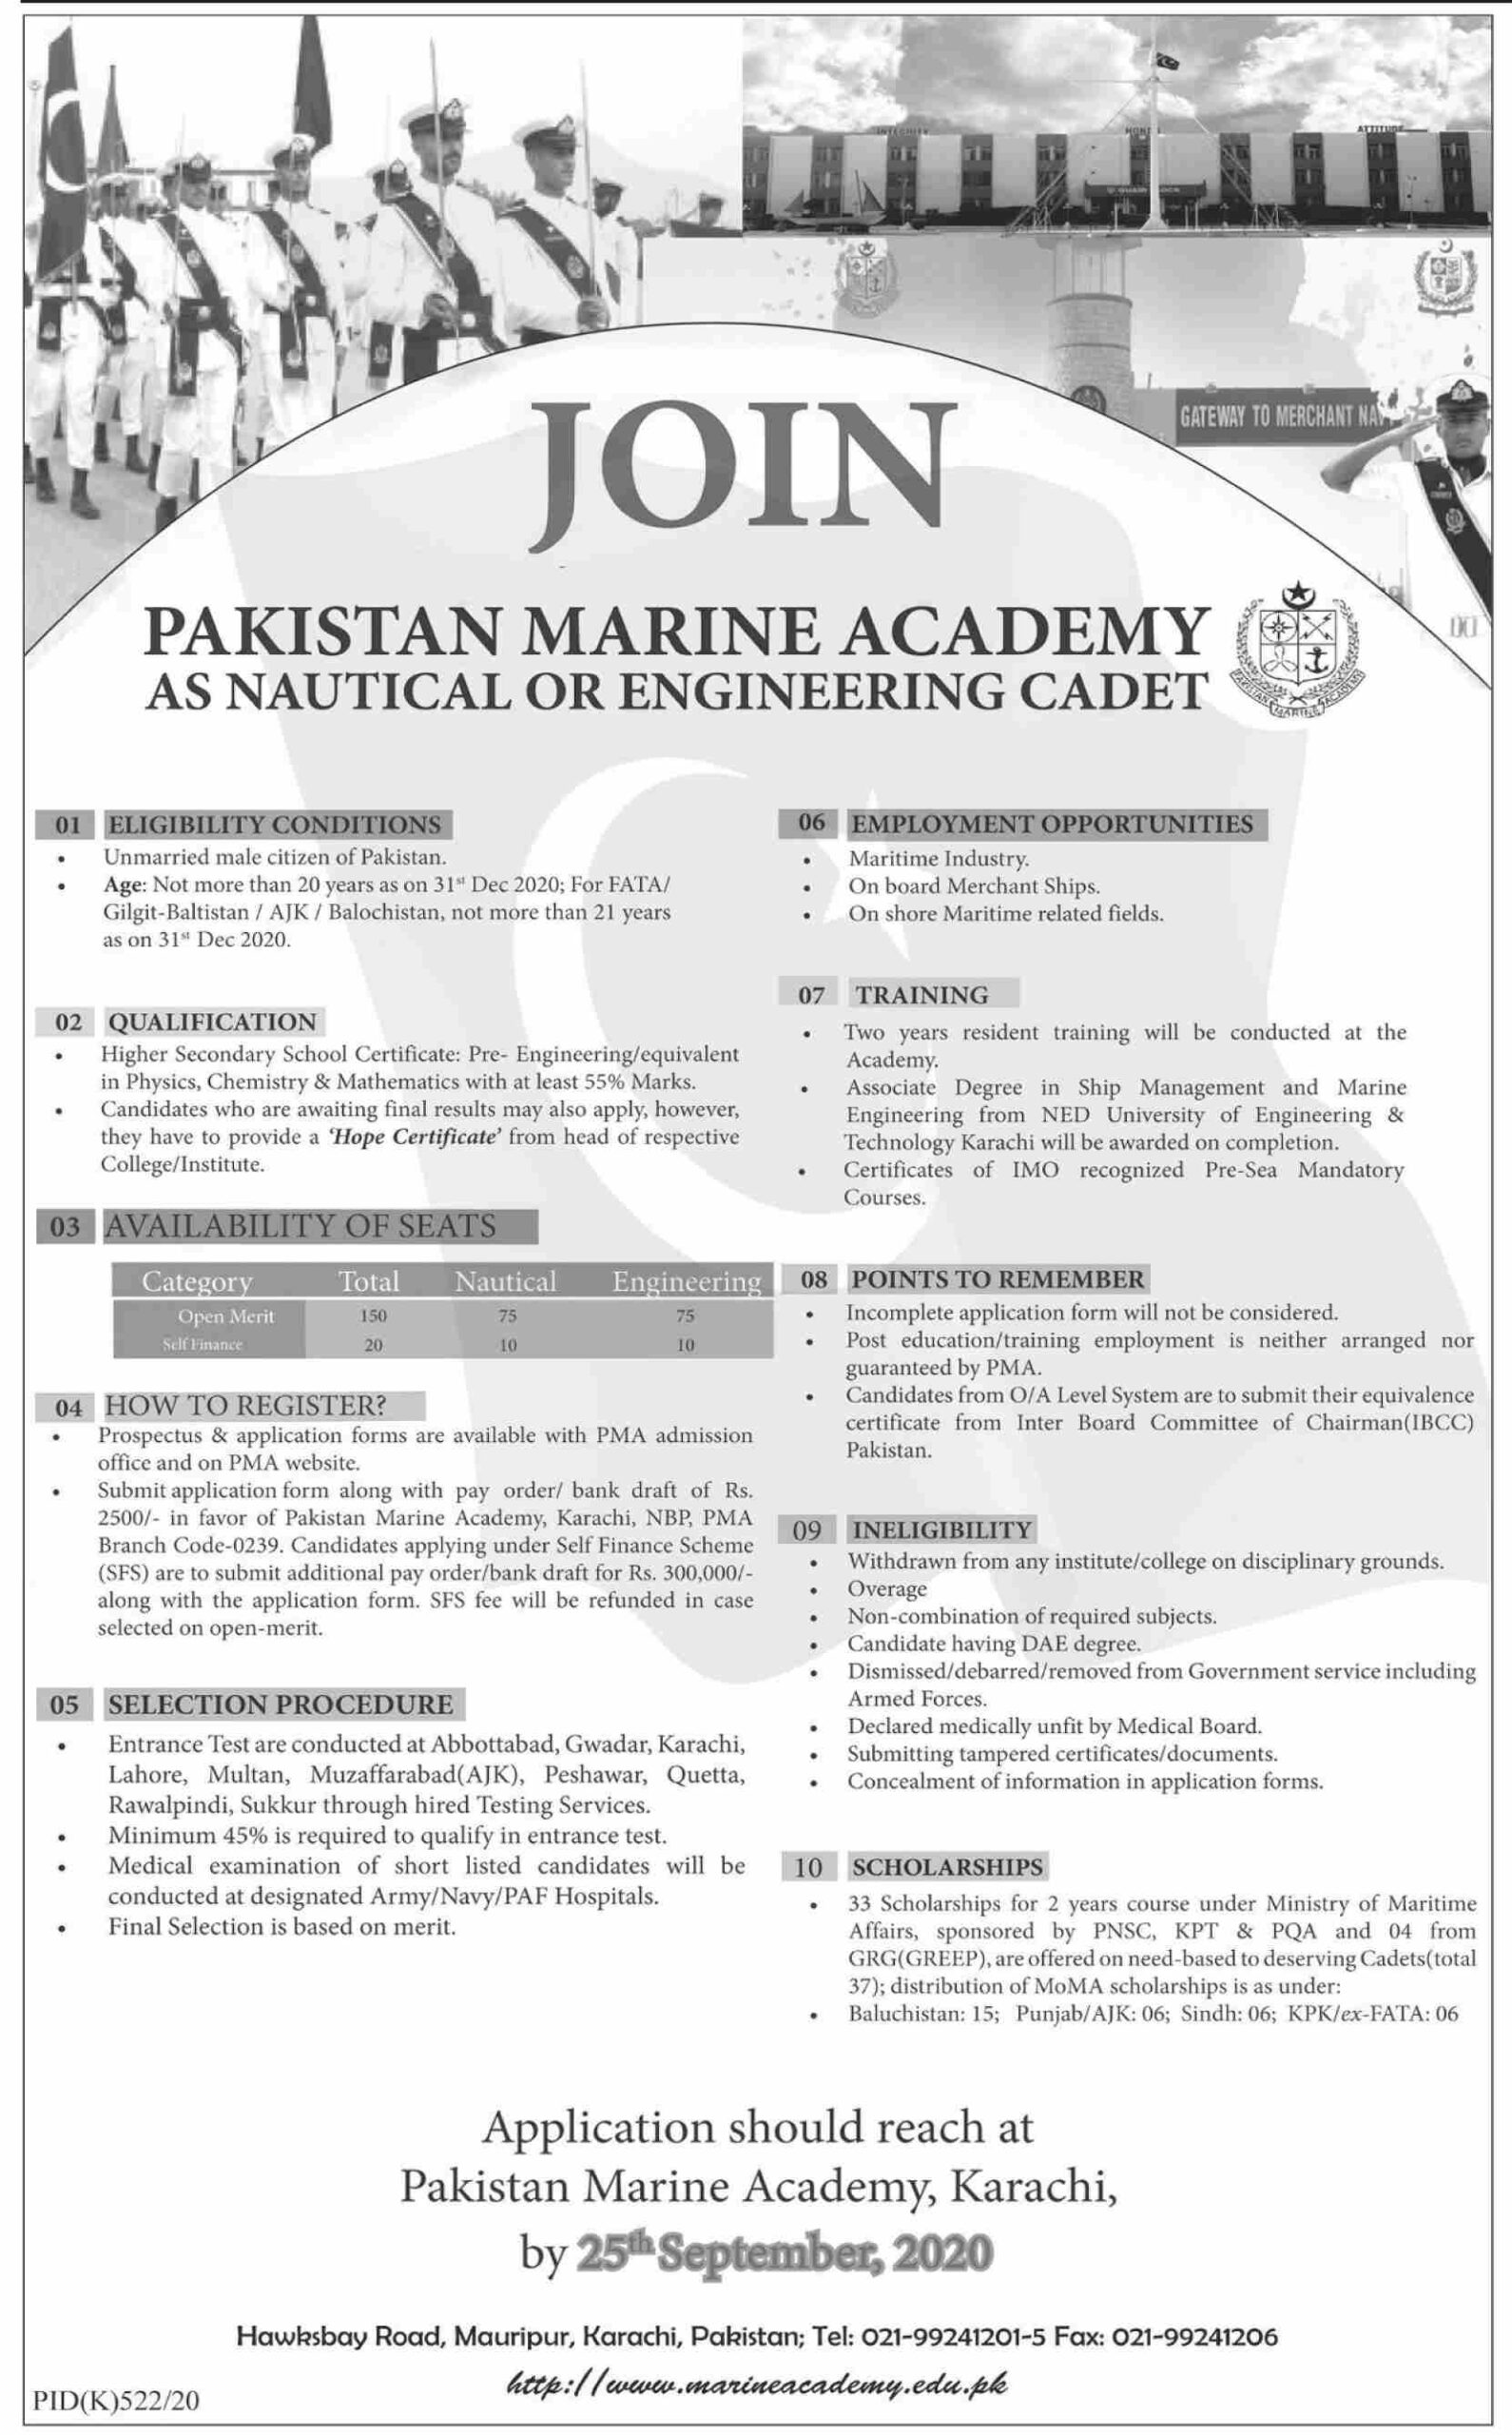 Pakistan Marine Academy Jobs August 2020 (50 Posts)